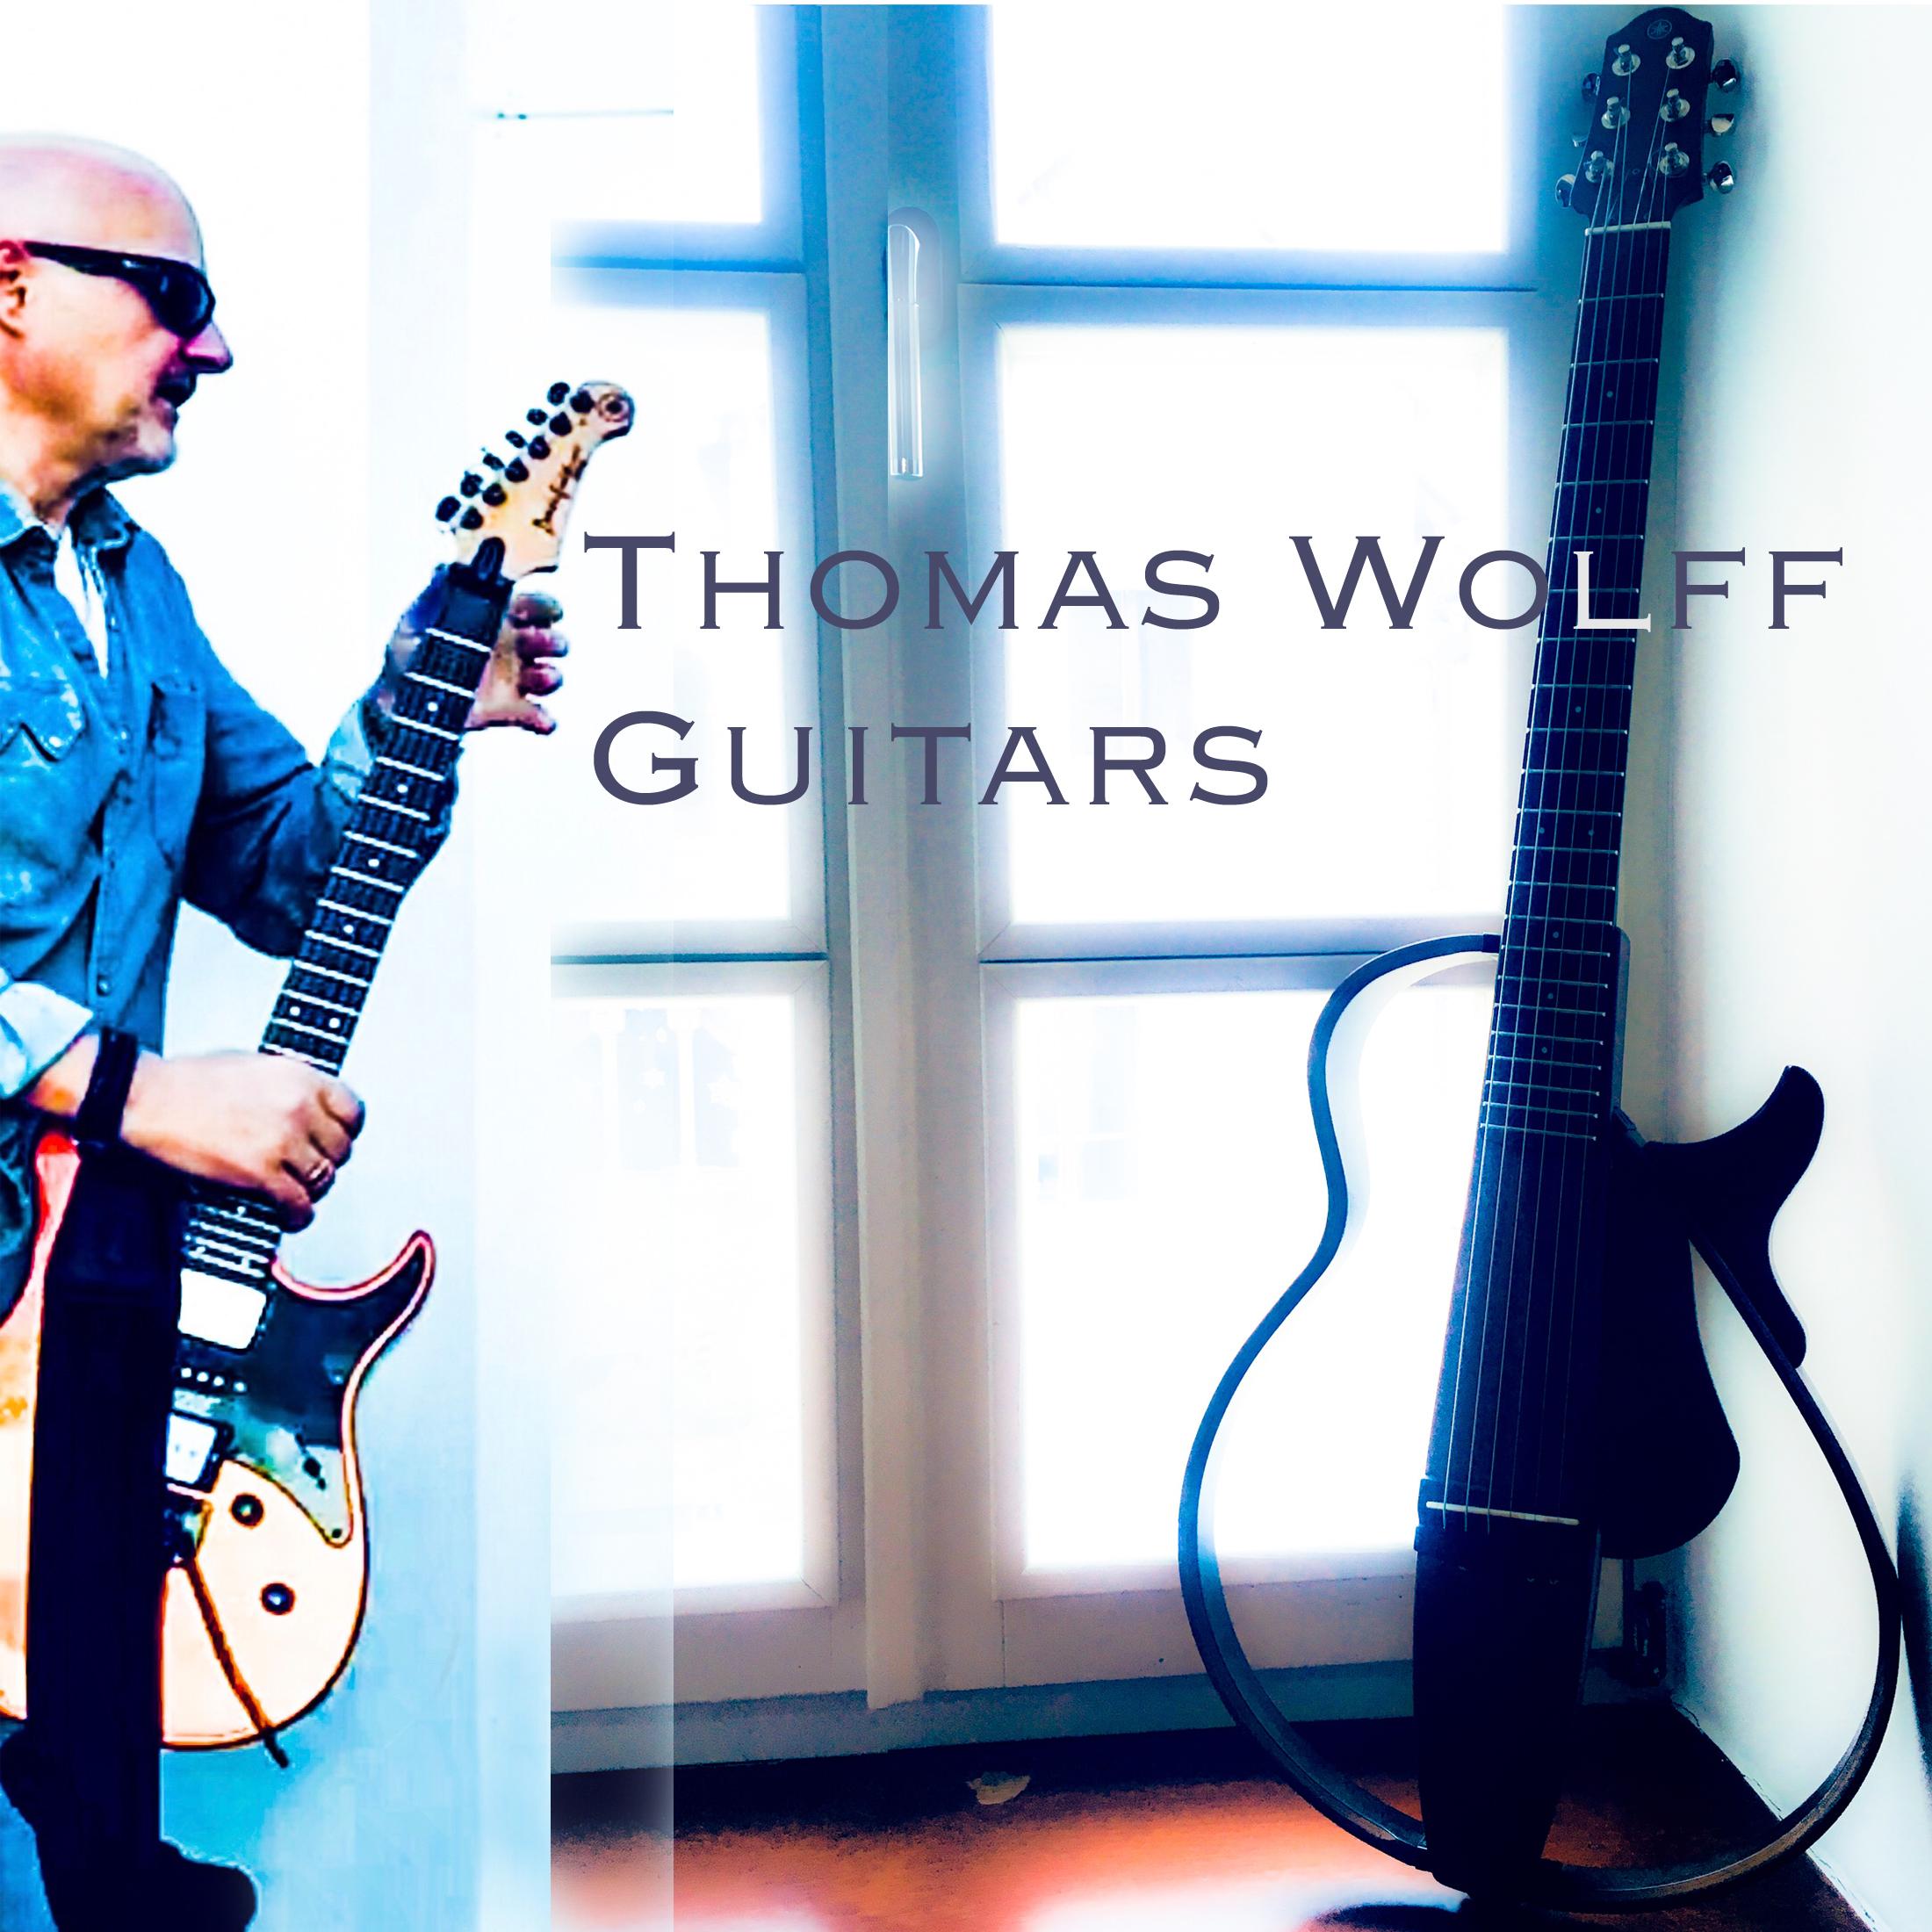 Thomas Wolff